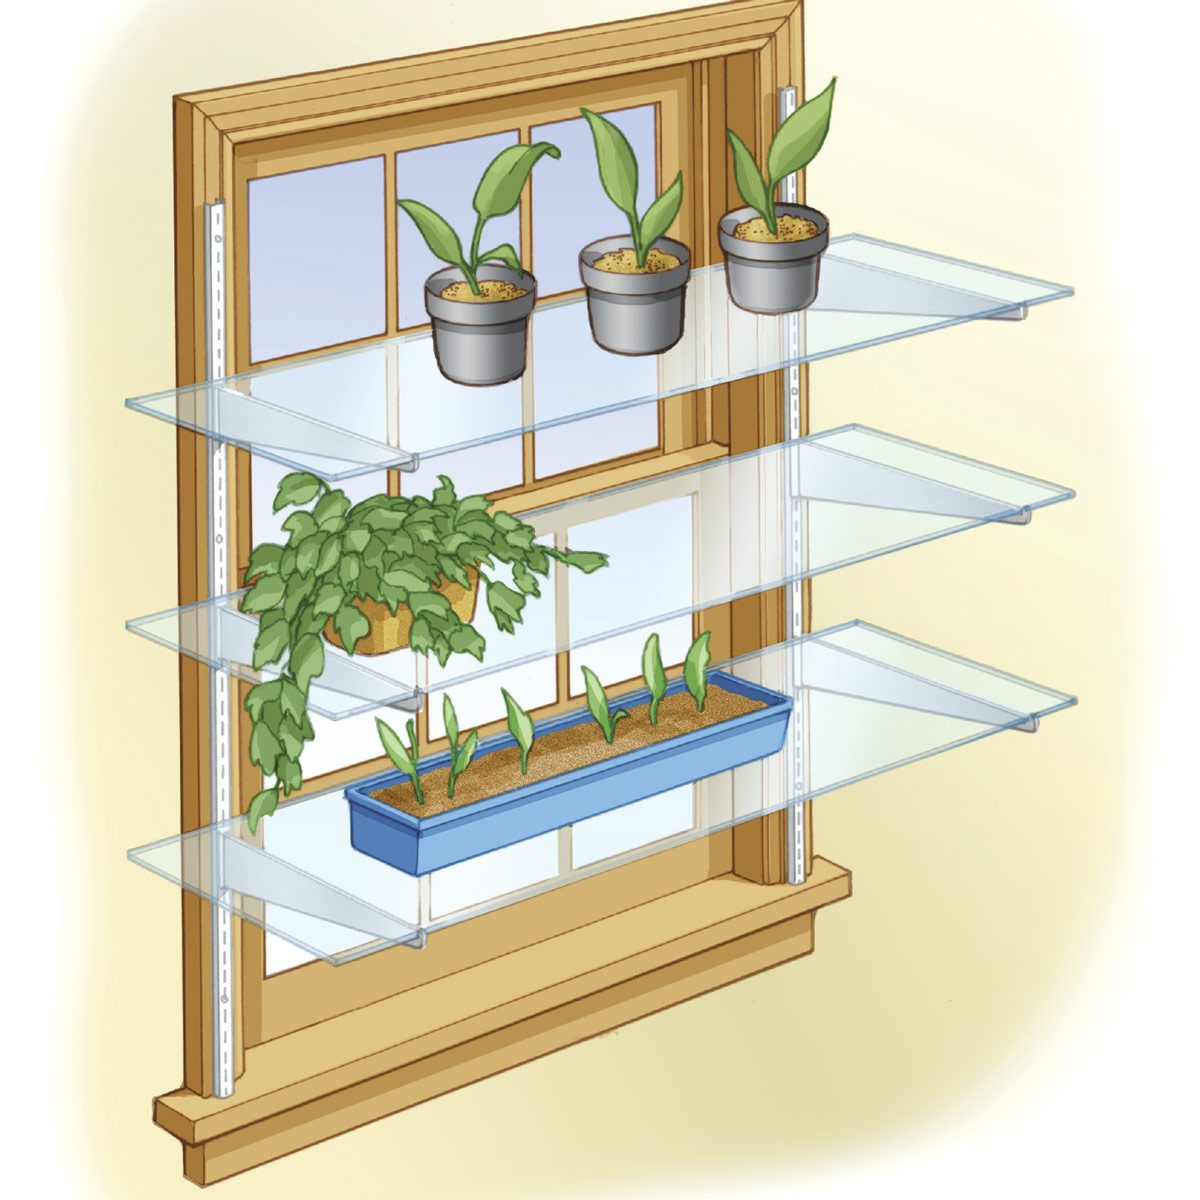 Window Greenhouse Insert Kitchen Window Greenhouses: The Family Handyman